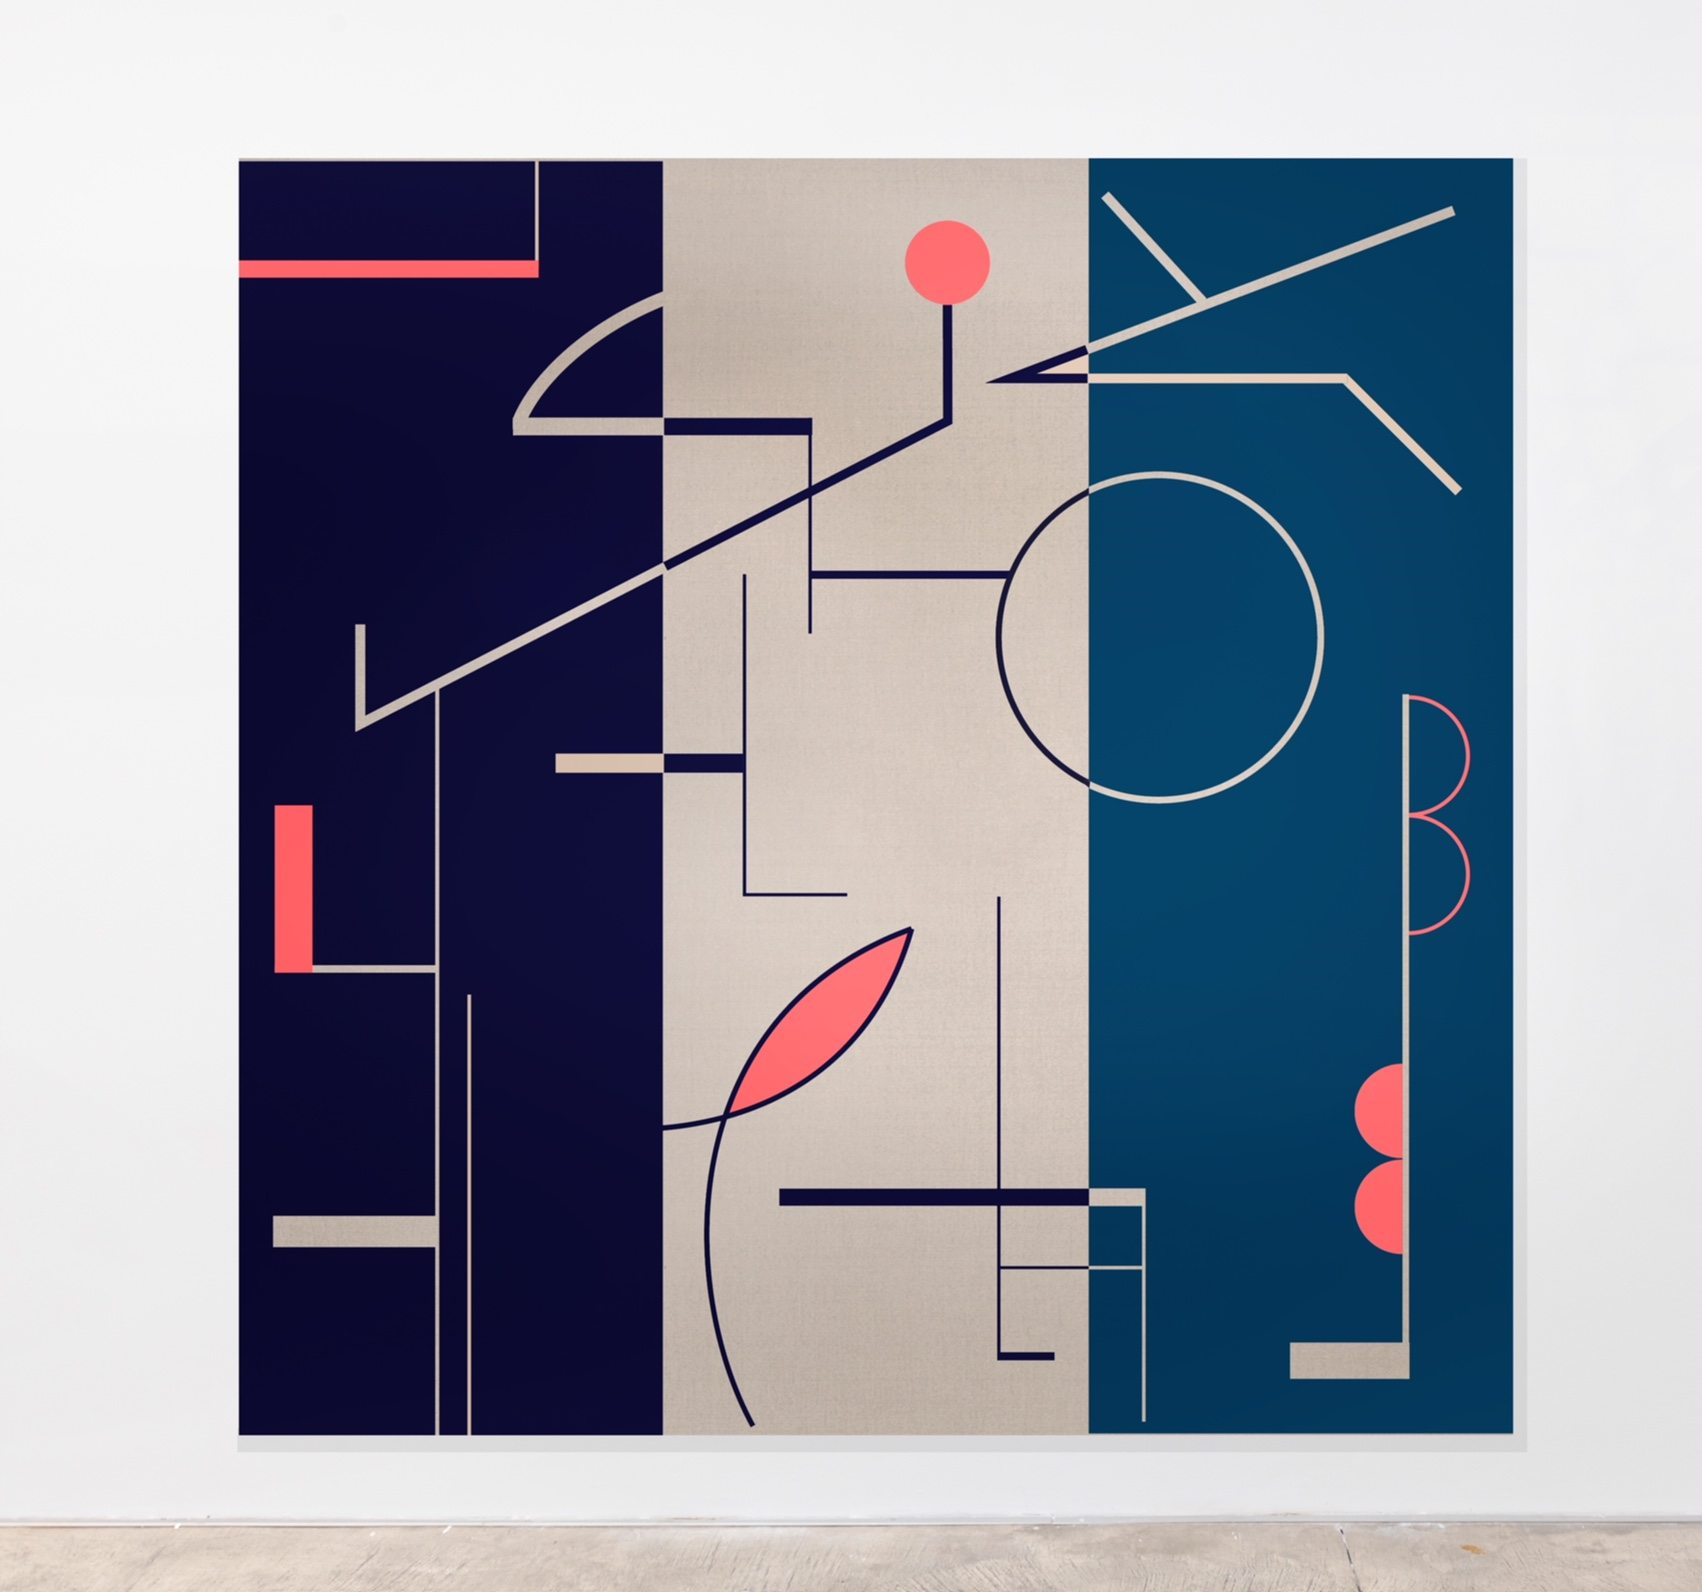 Trebuchet Talks: Art curation